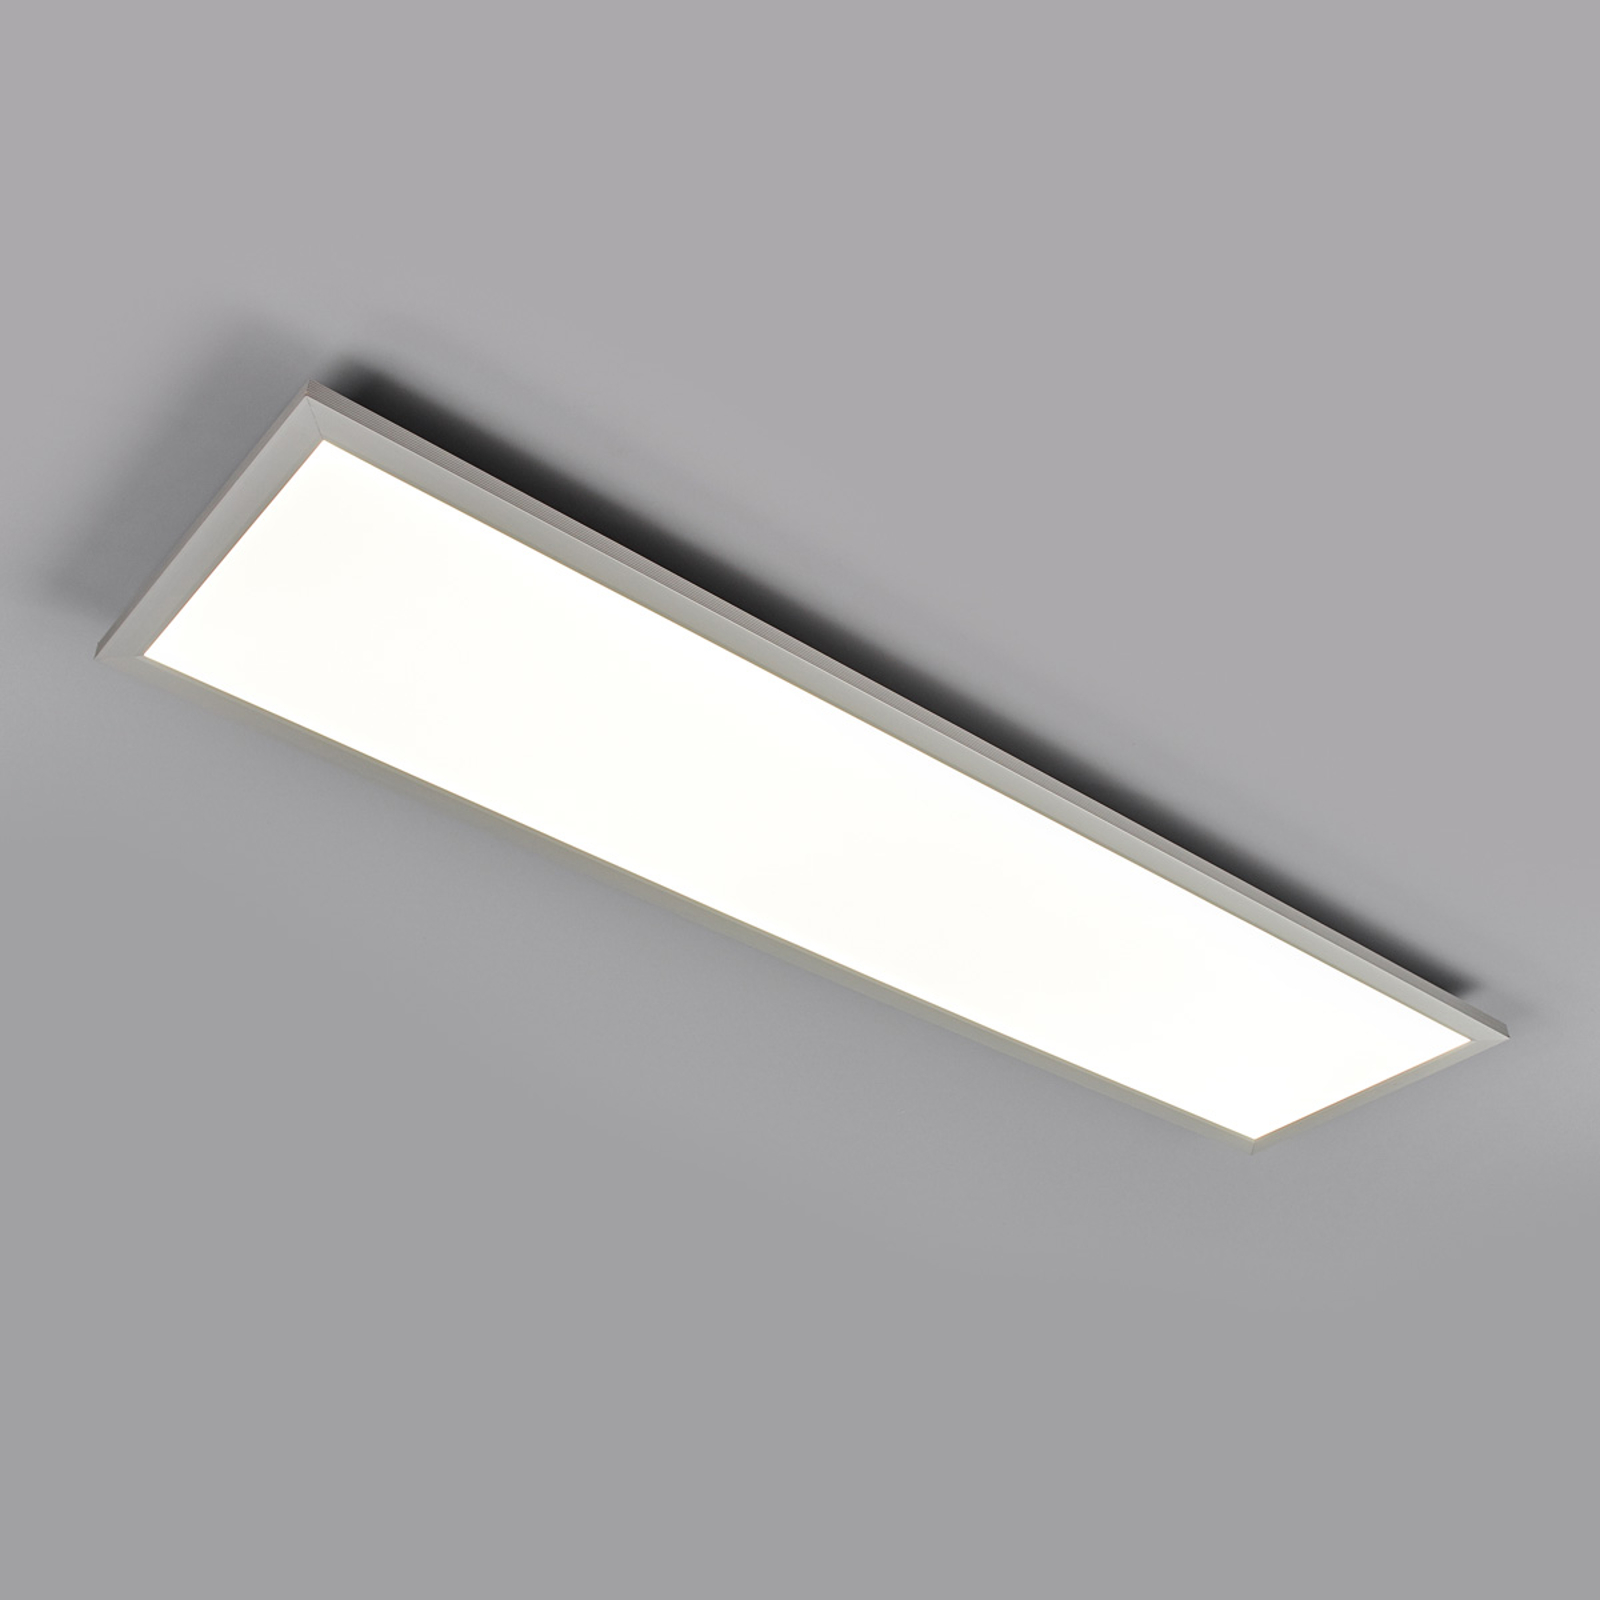 LED-paneeli All in One 120x30cm 5300K